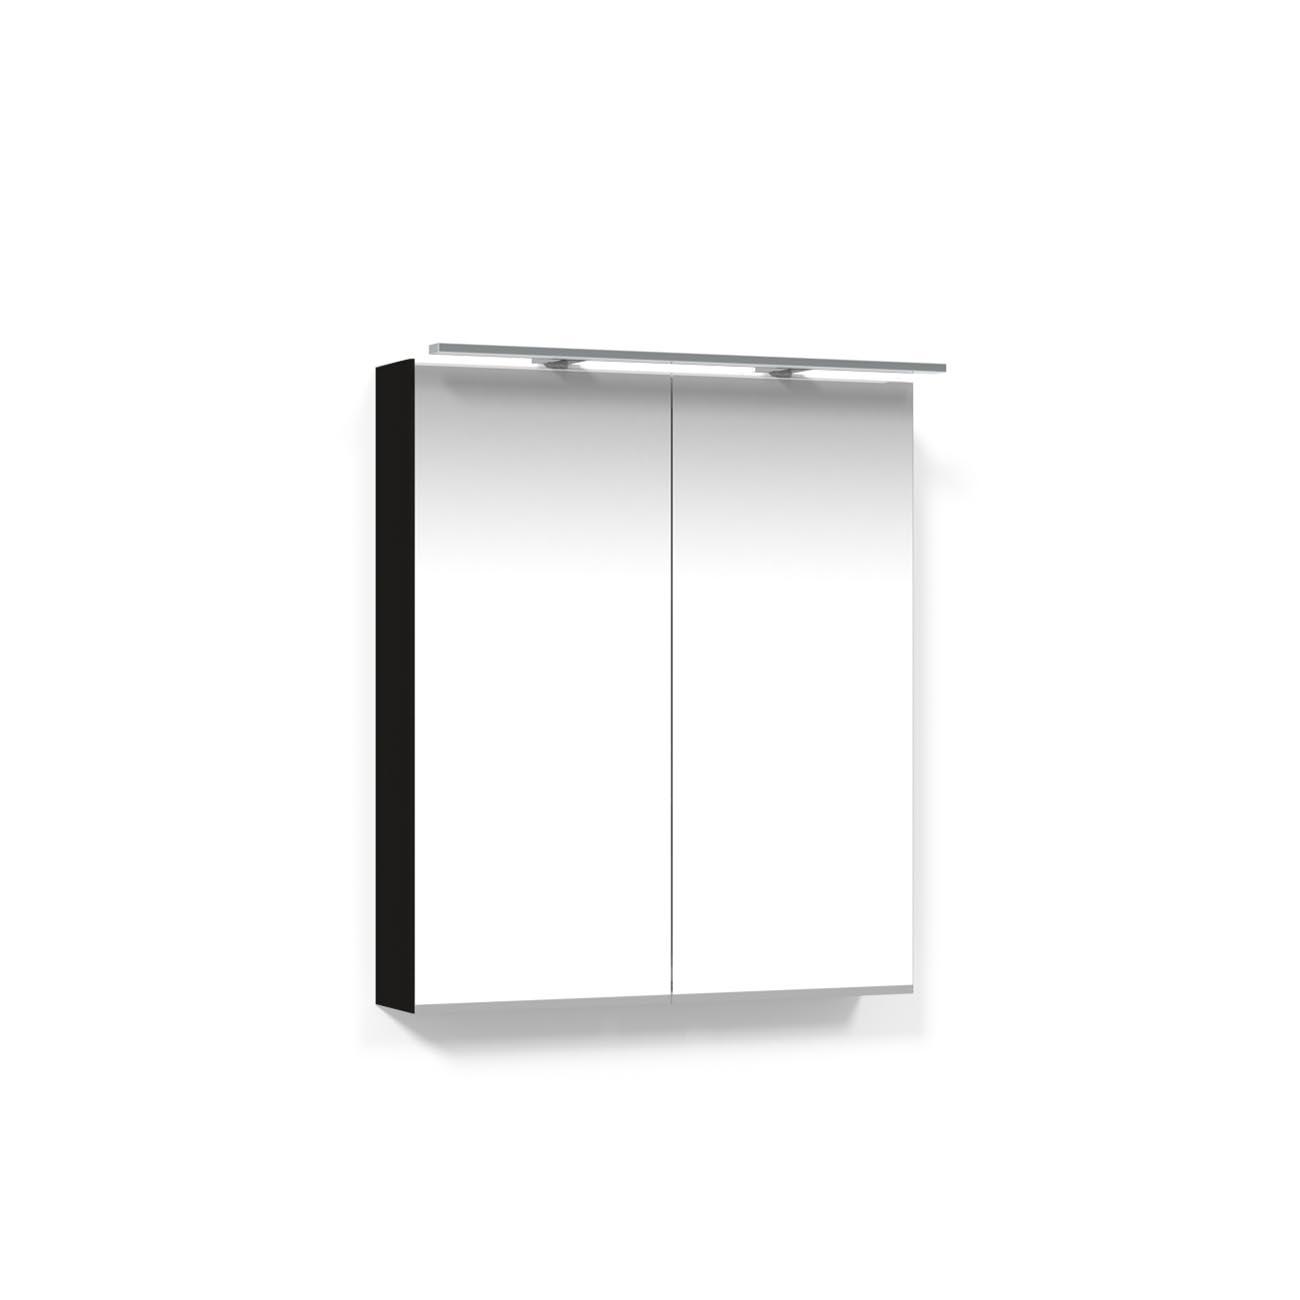 Spegelskåp Macro Design 600 Rampbelysning LED